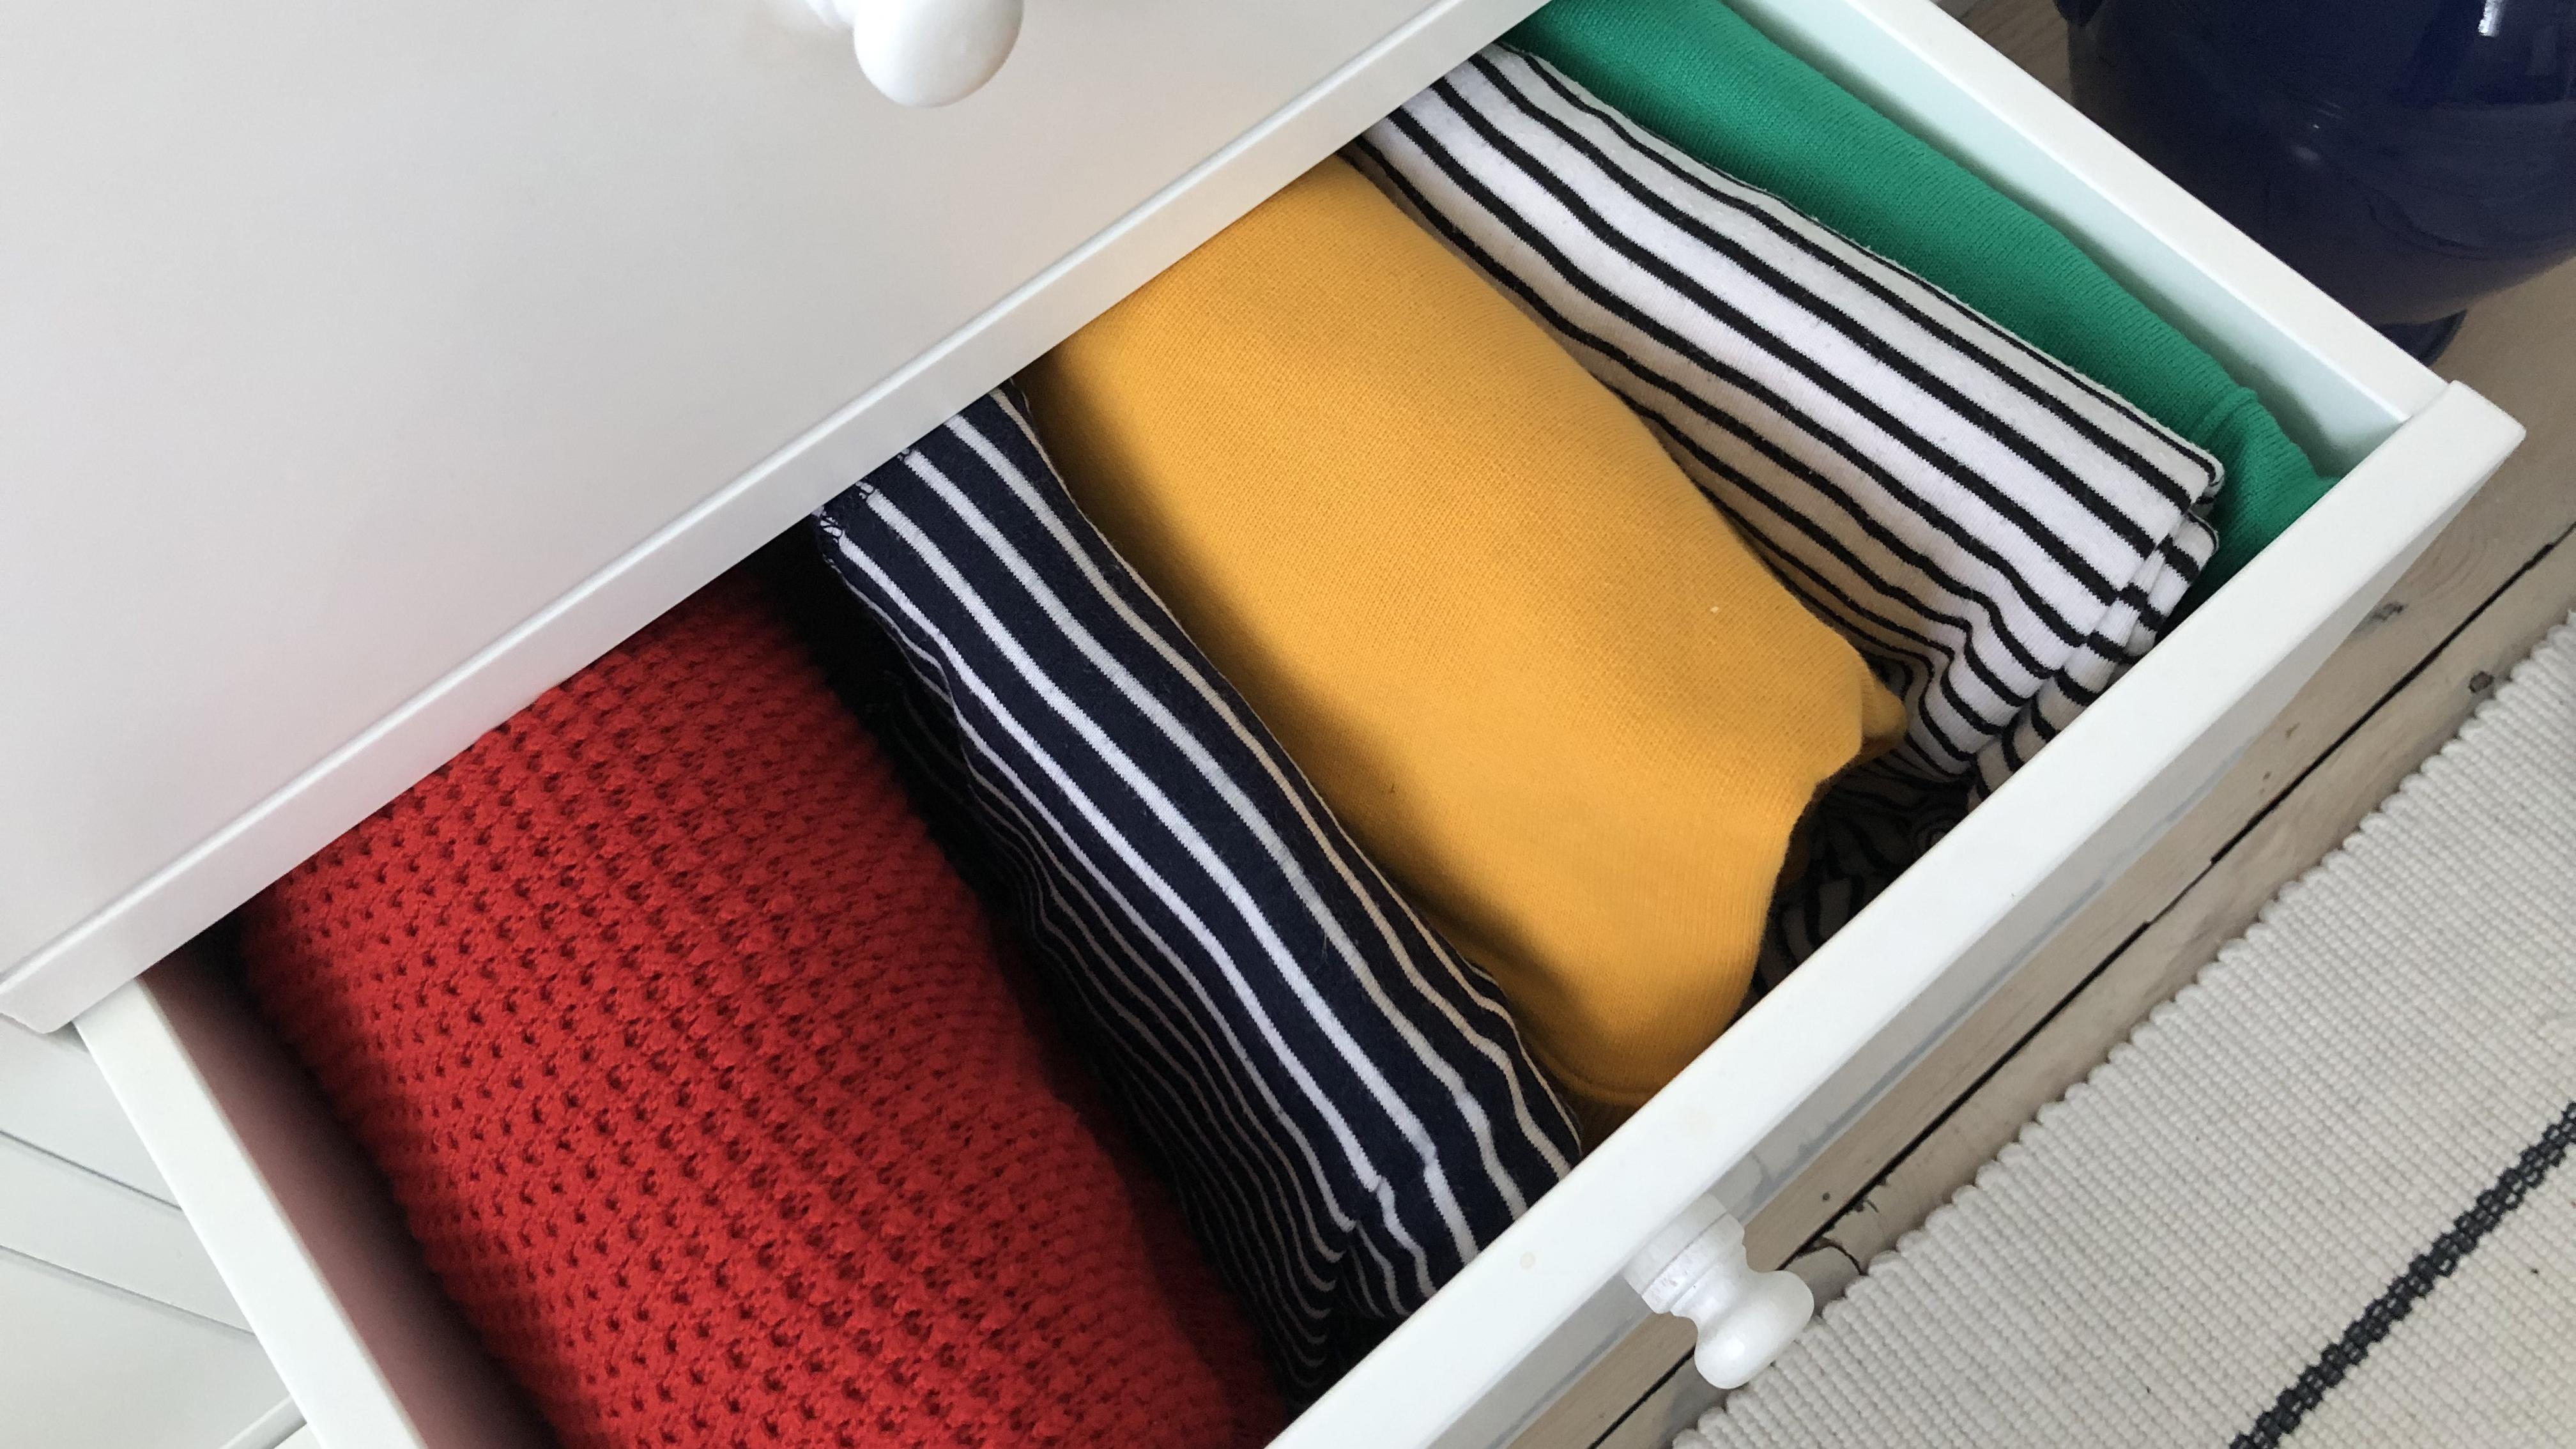 Marie Kondo Folding How To Do Konmari Folding Real Homes